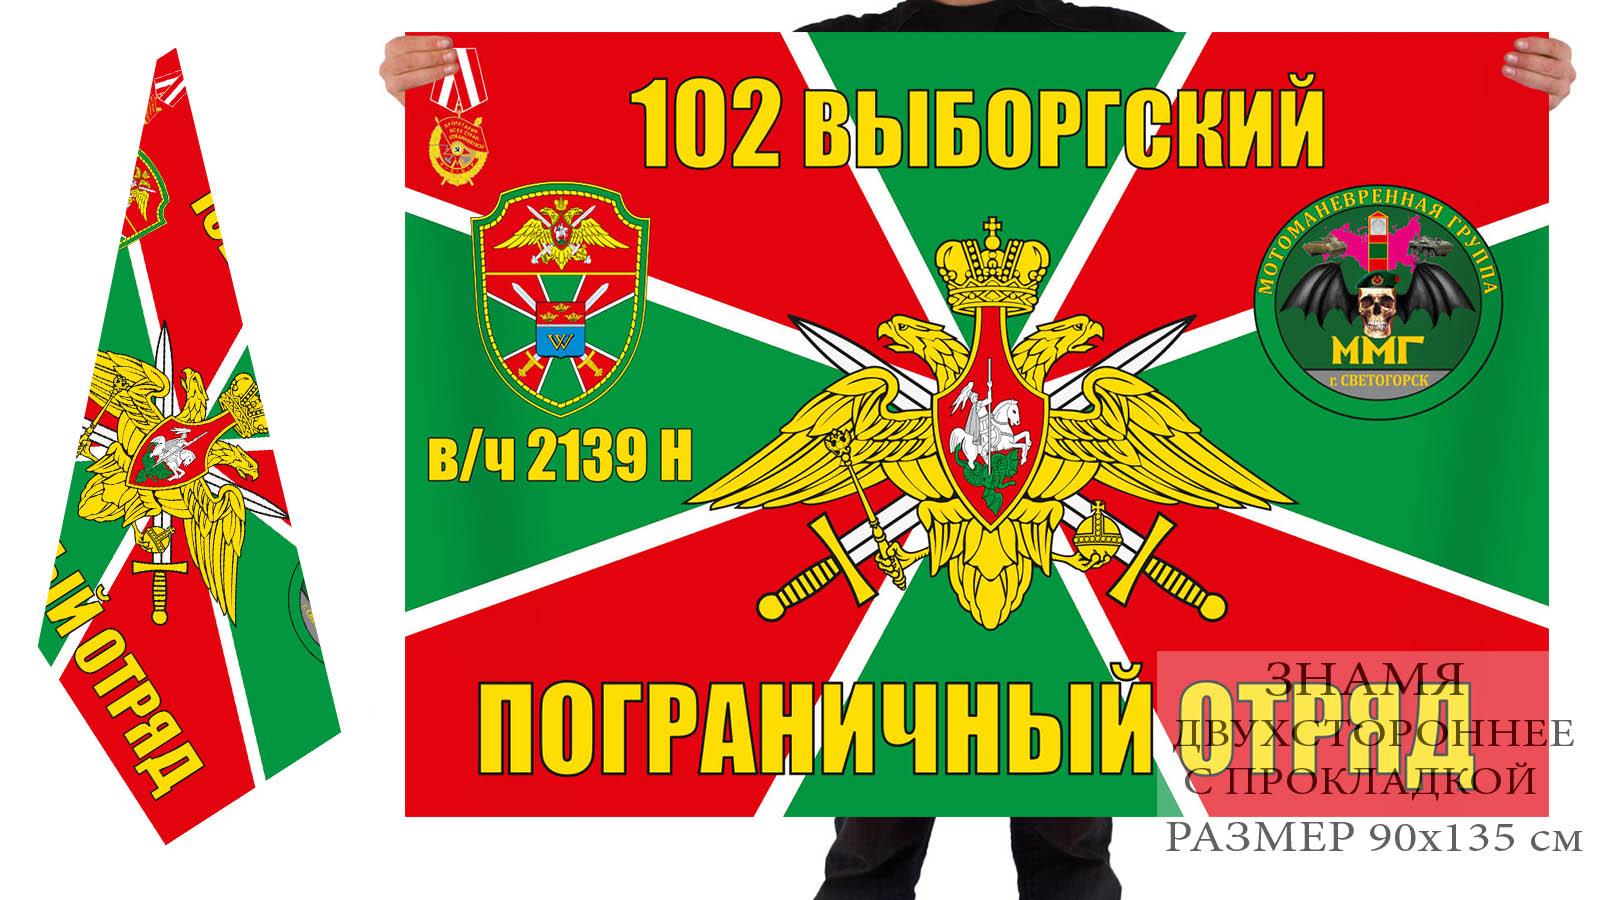 Двусторонний флаг мотоманёвренной группы 102 погранотряда